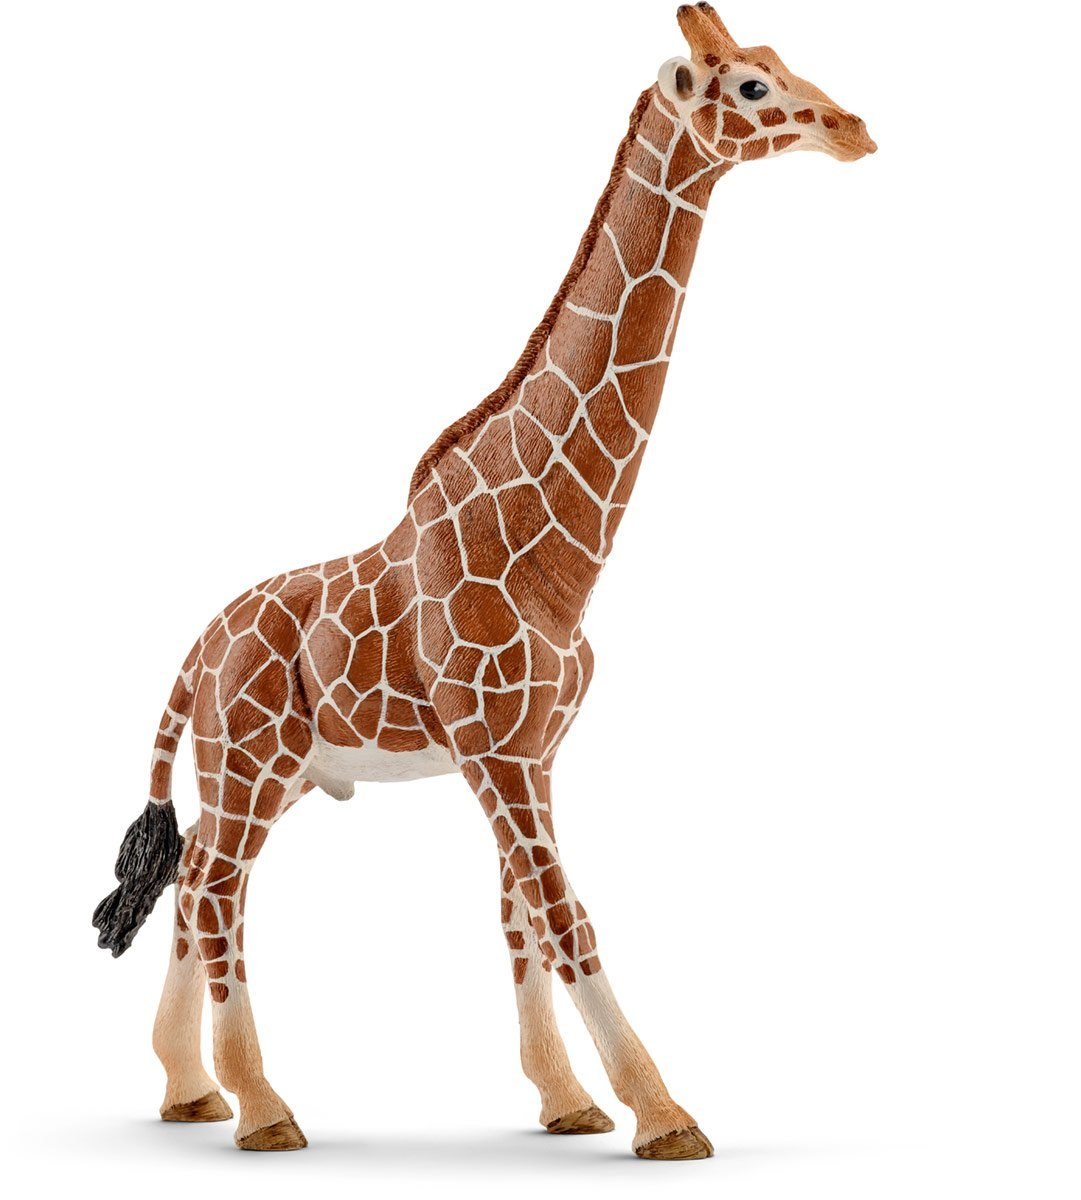 Купить Фигурка – Самец жирафа, 17 см, Schleich